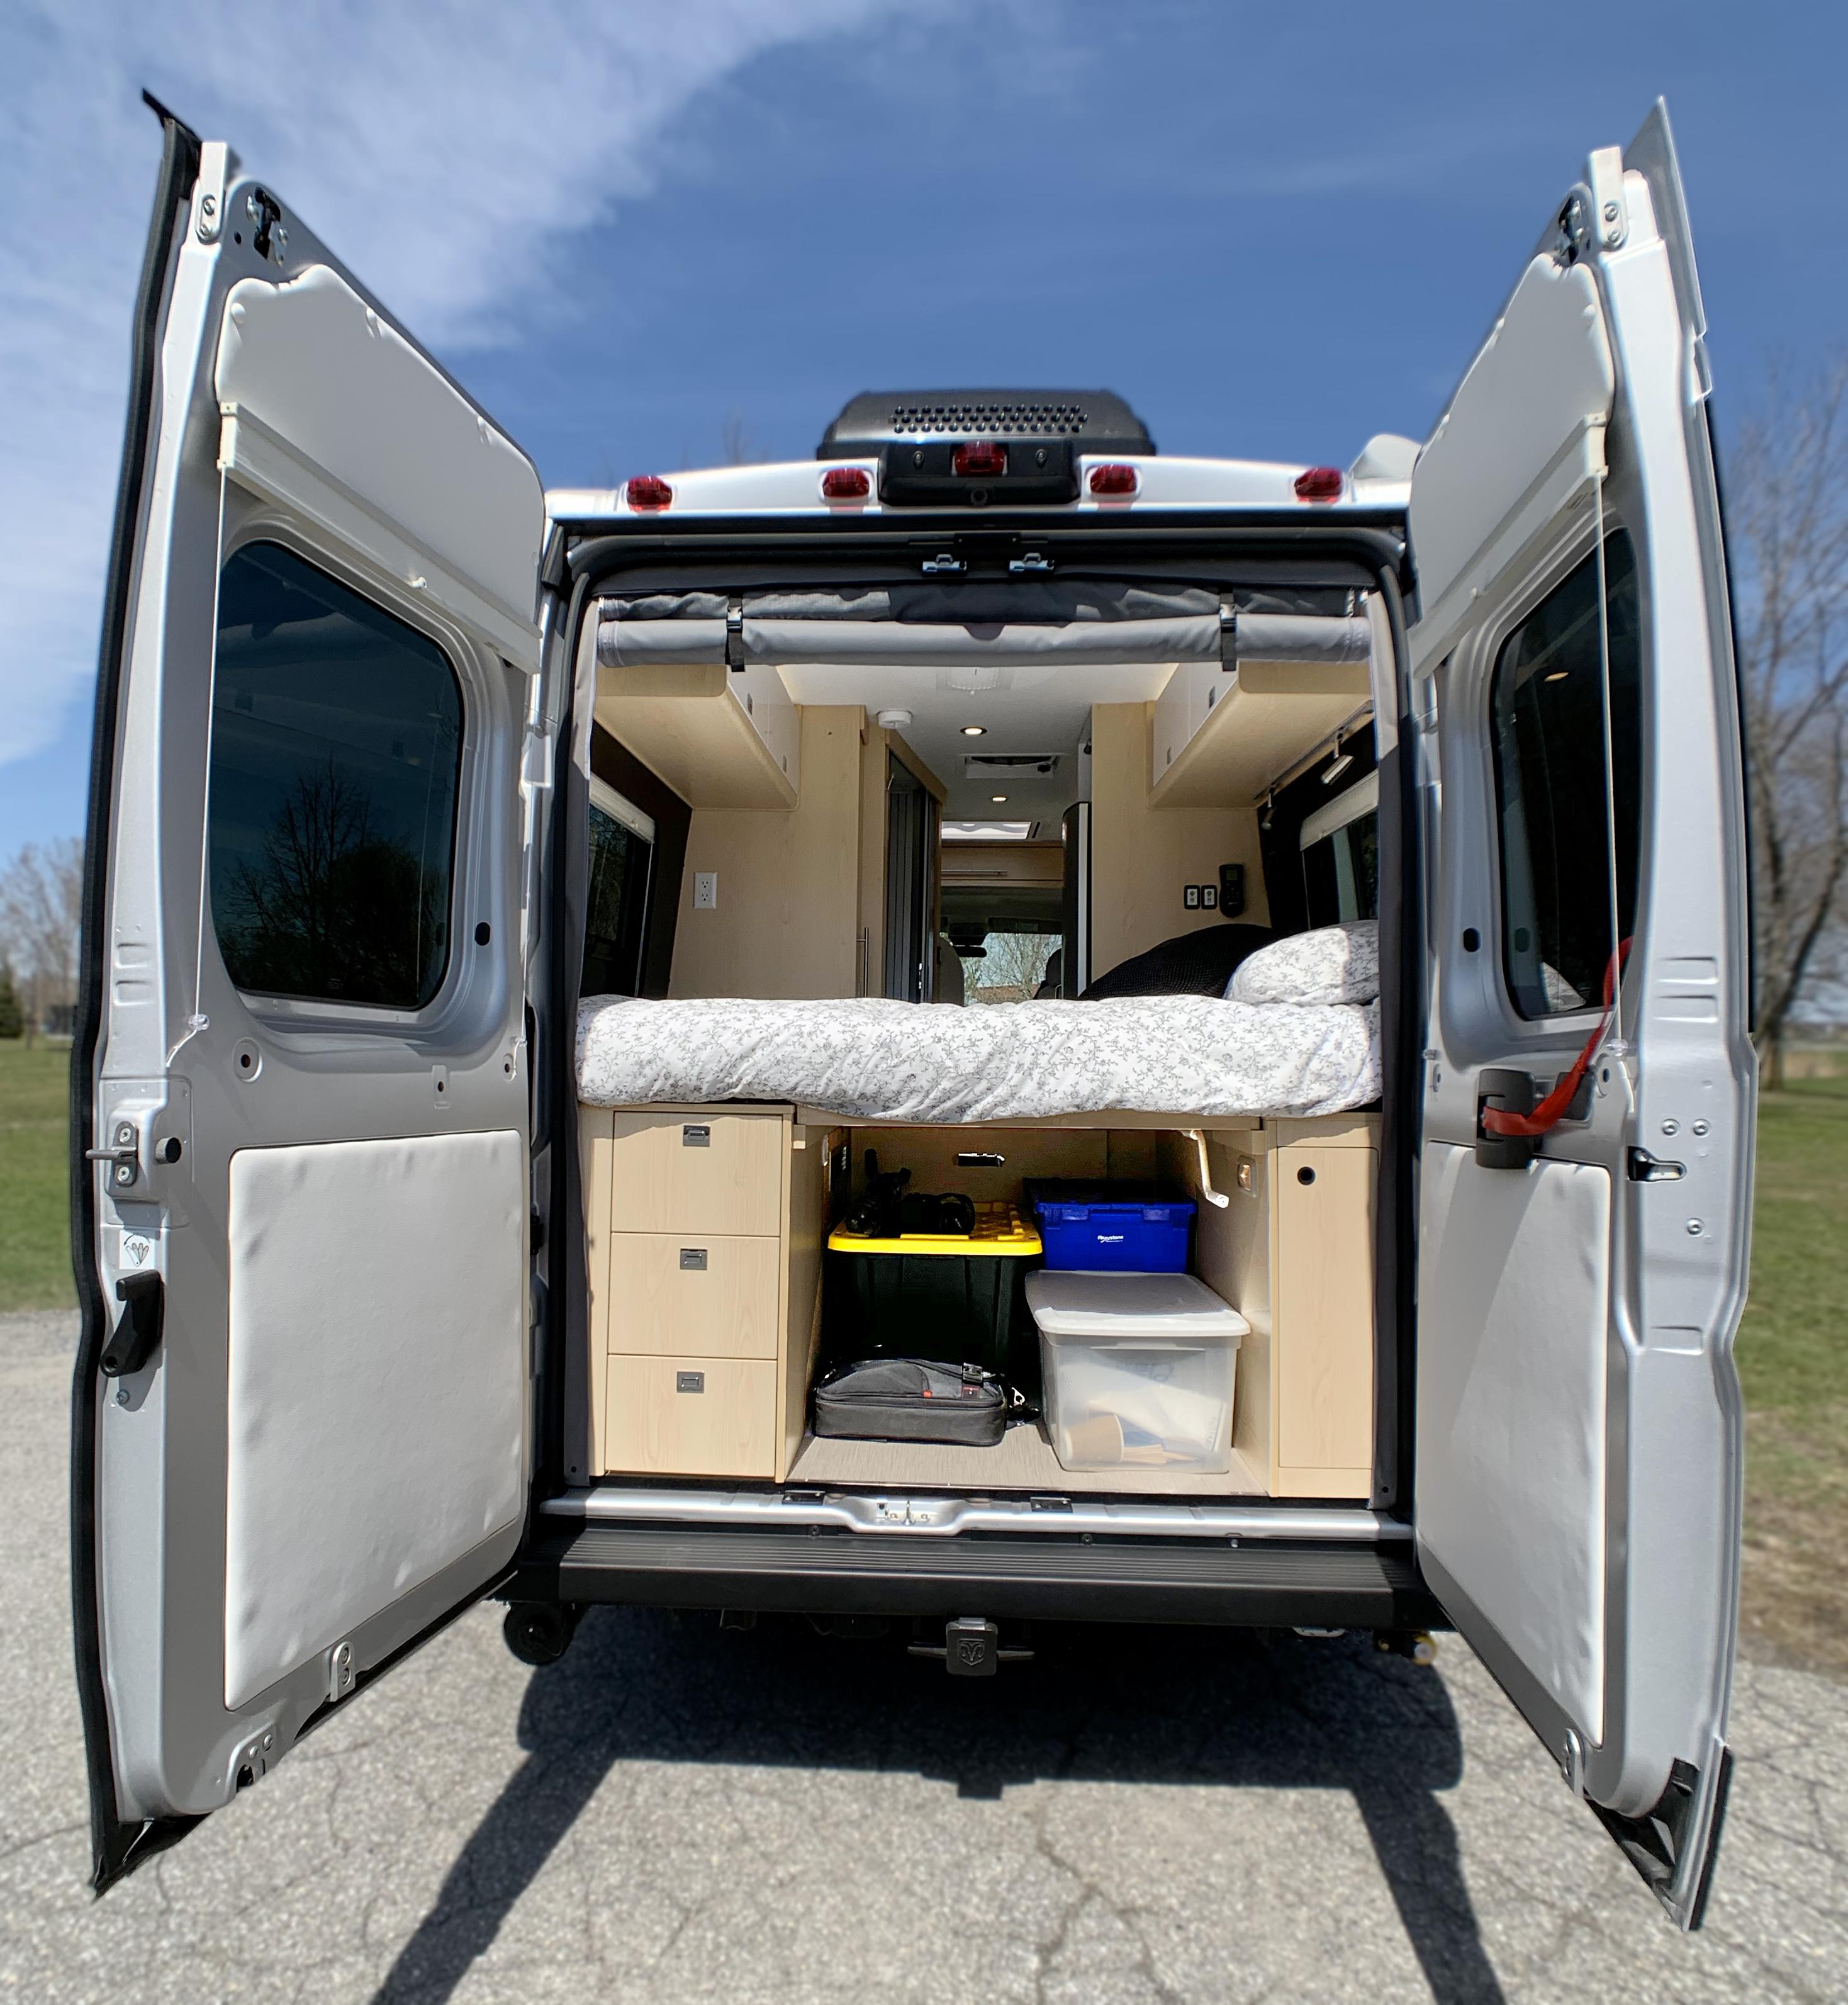 Panoramic RV - Cargo 3